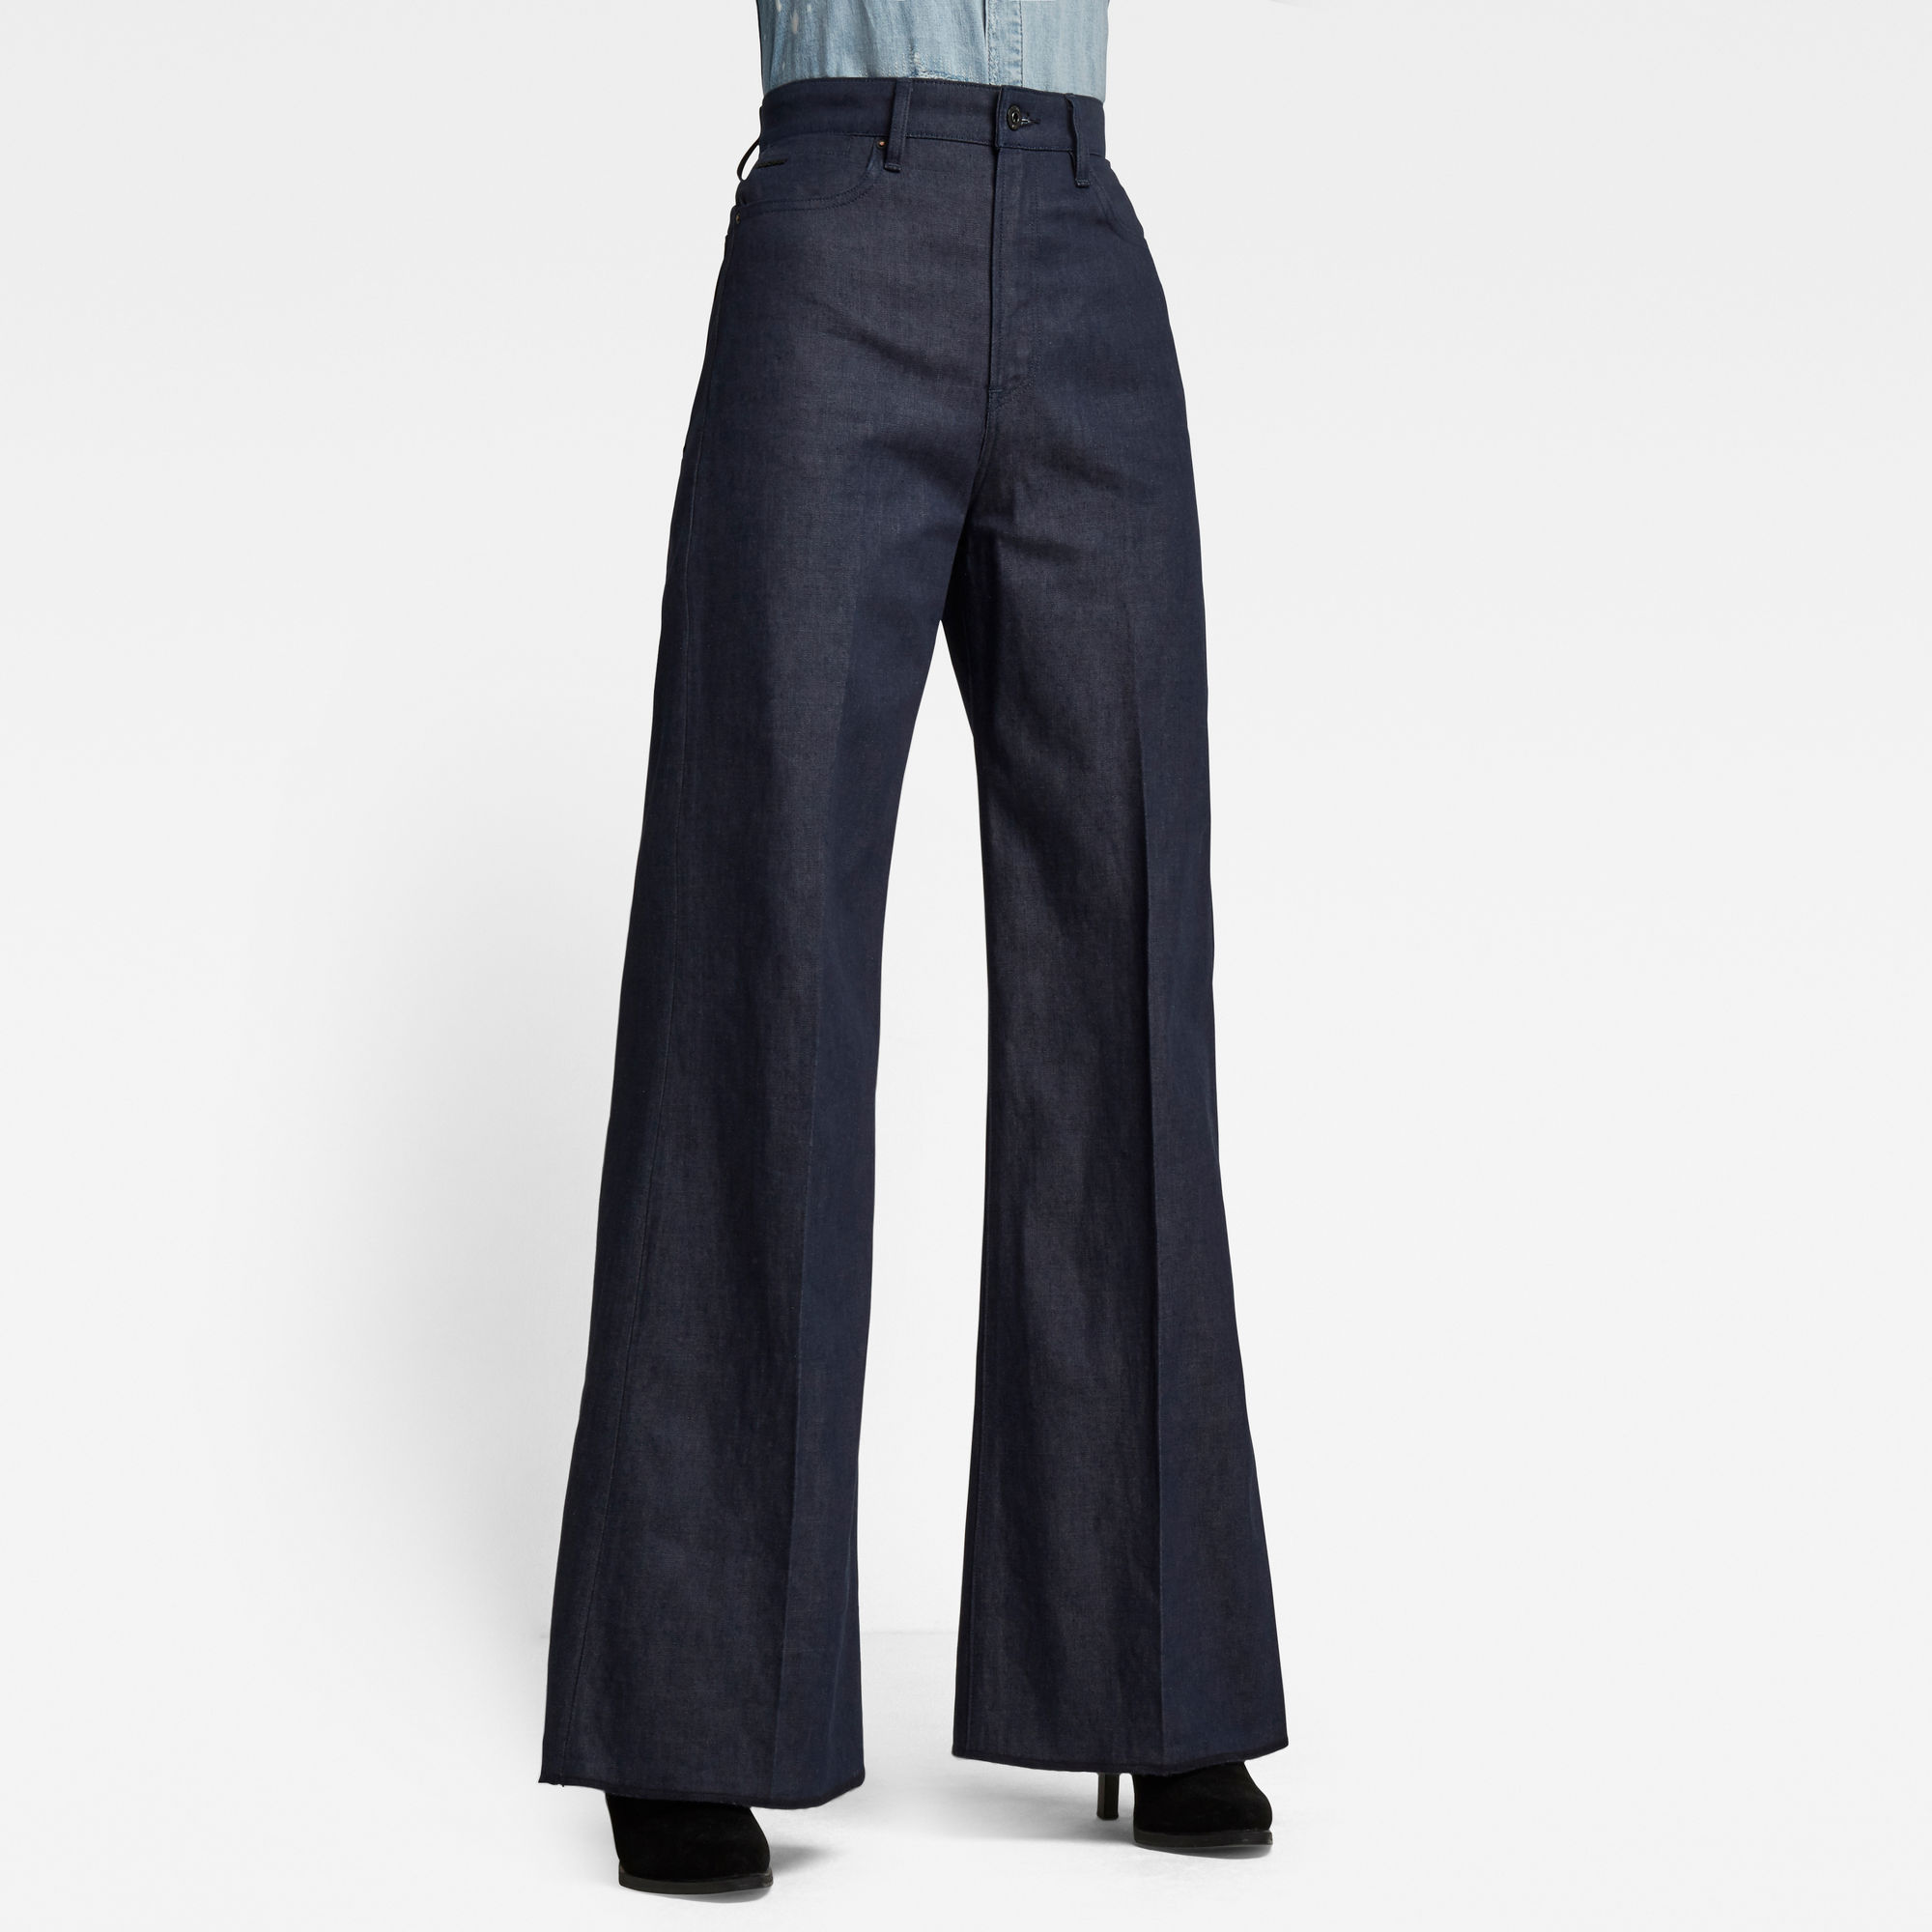 G-Star RAW Dames Deck Ultra High Wide Leg Jeans Donkerblauw